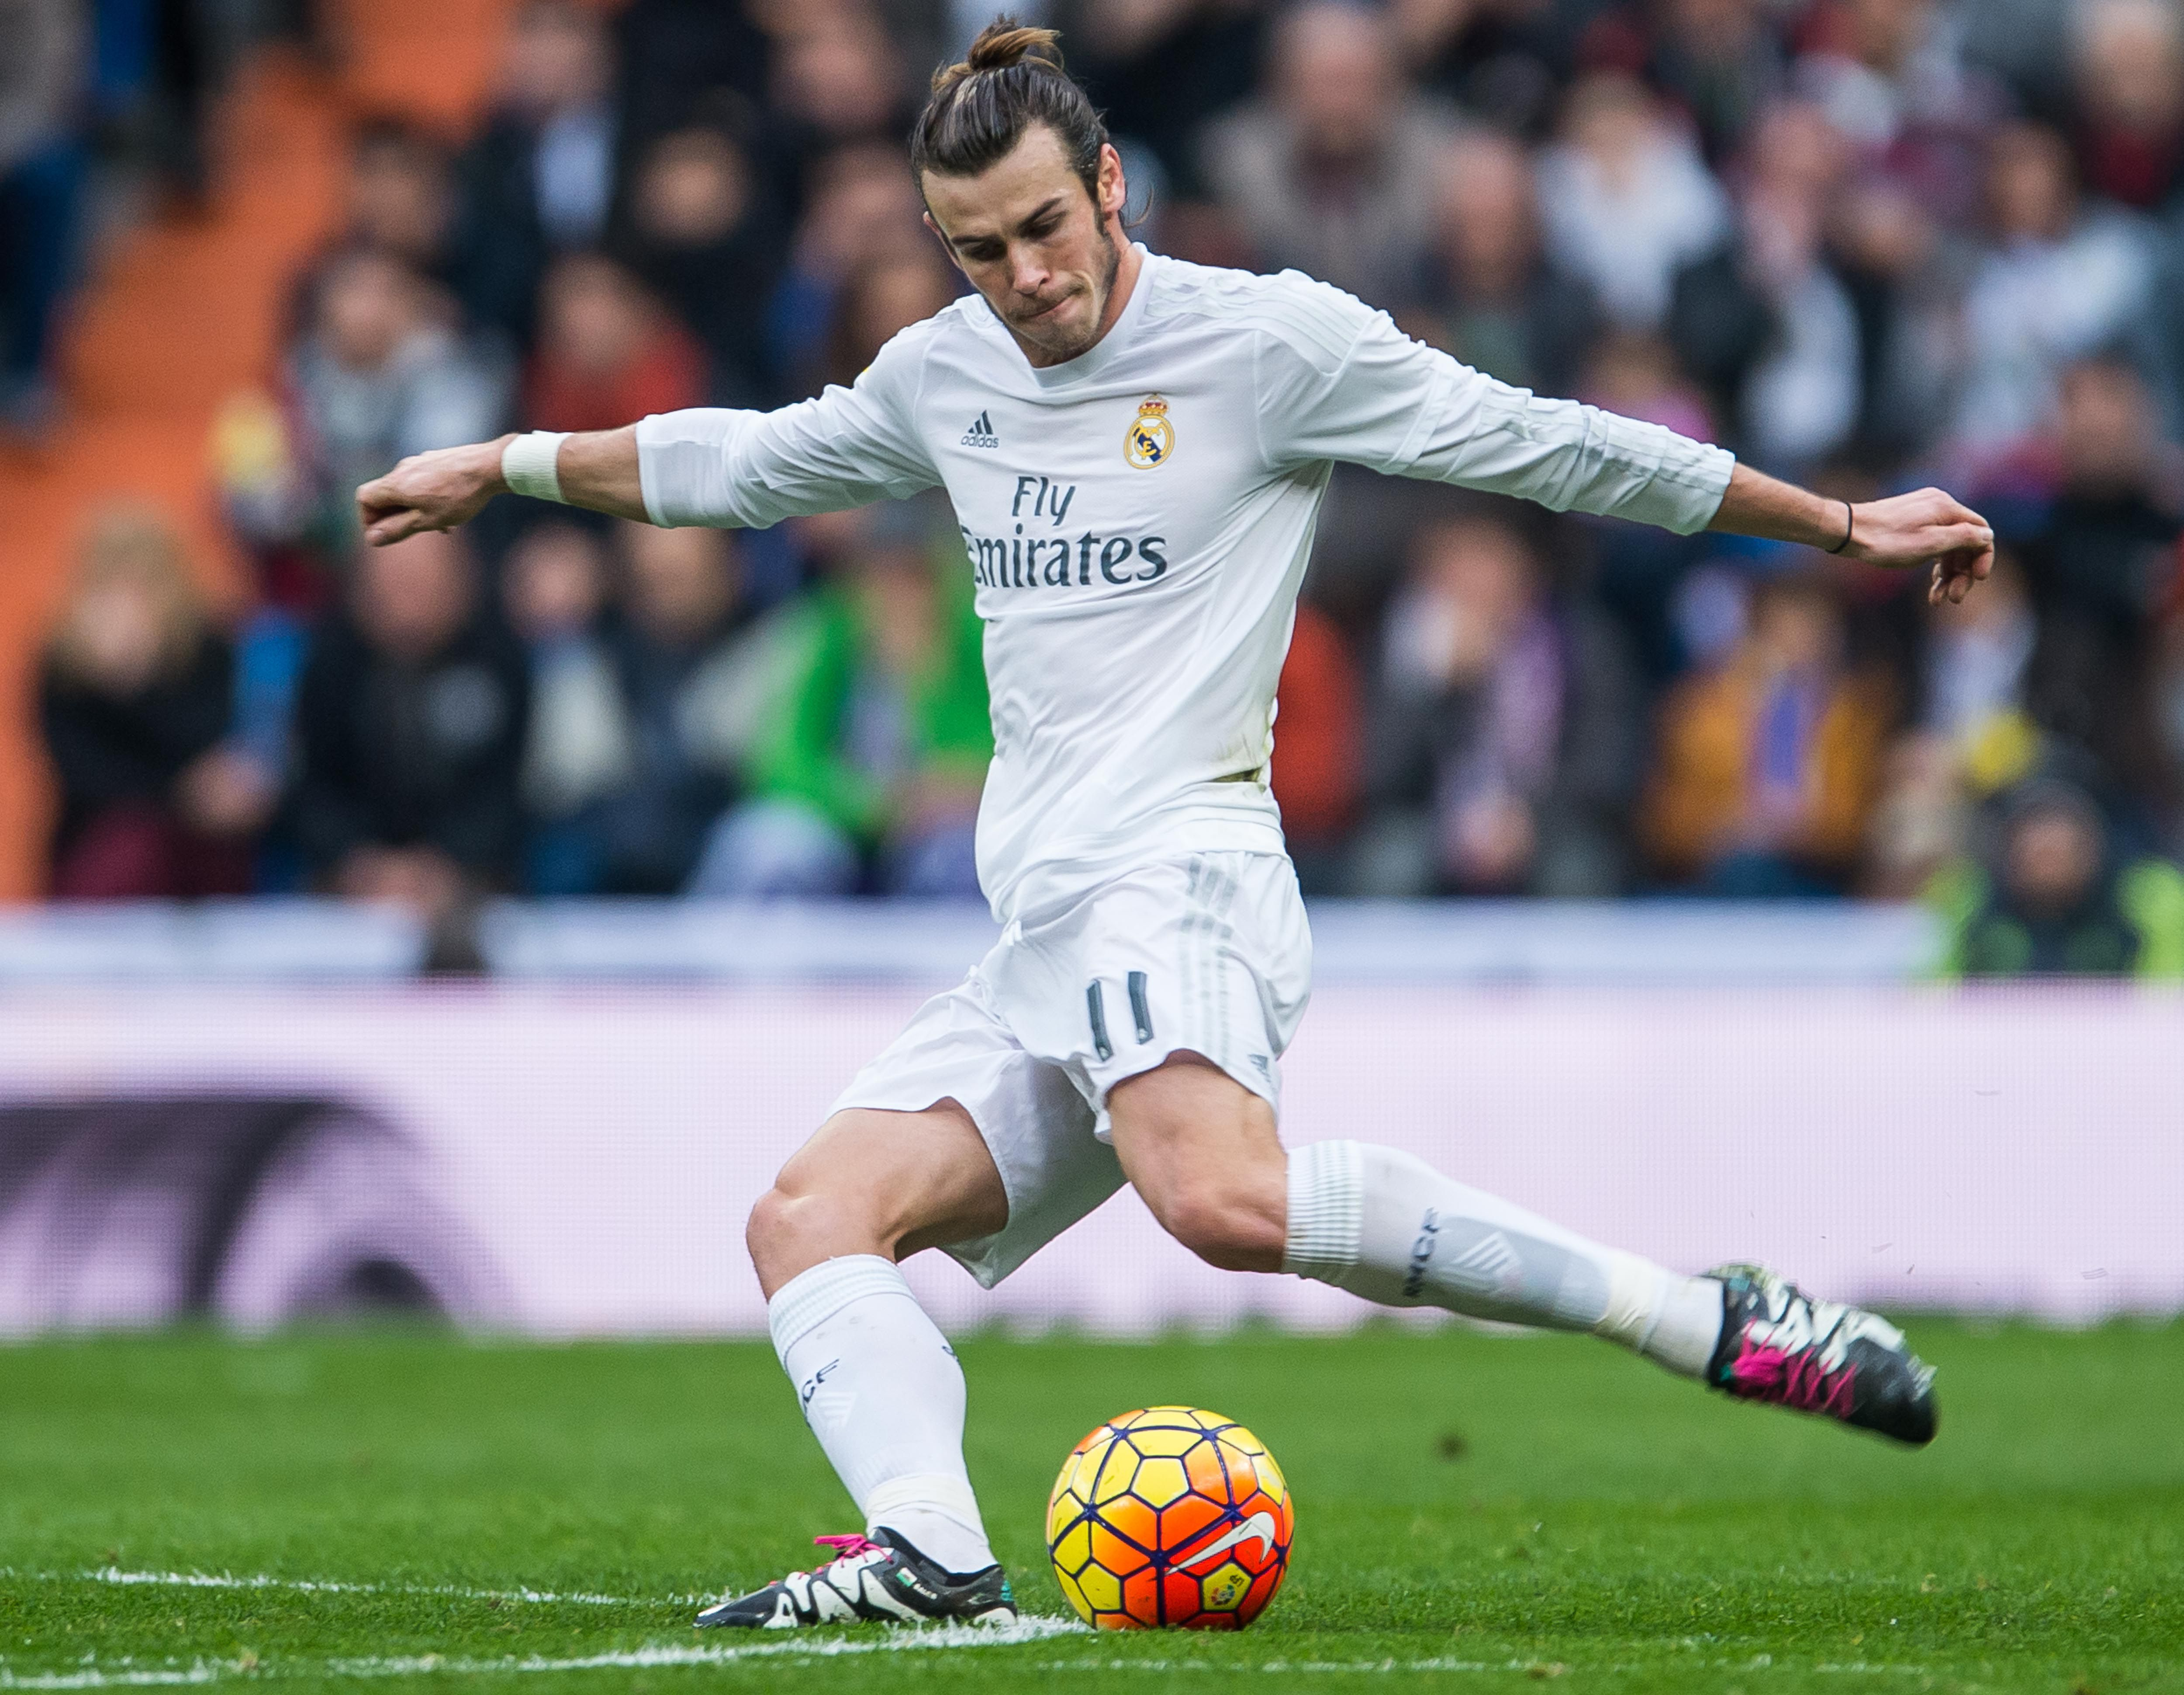 Gareth Bale kicking a soccer ball